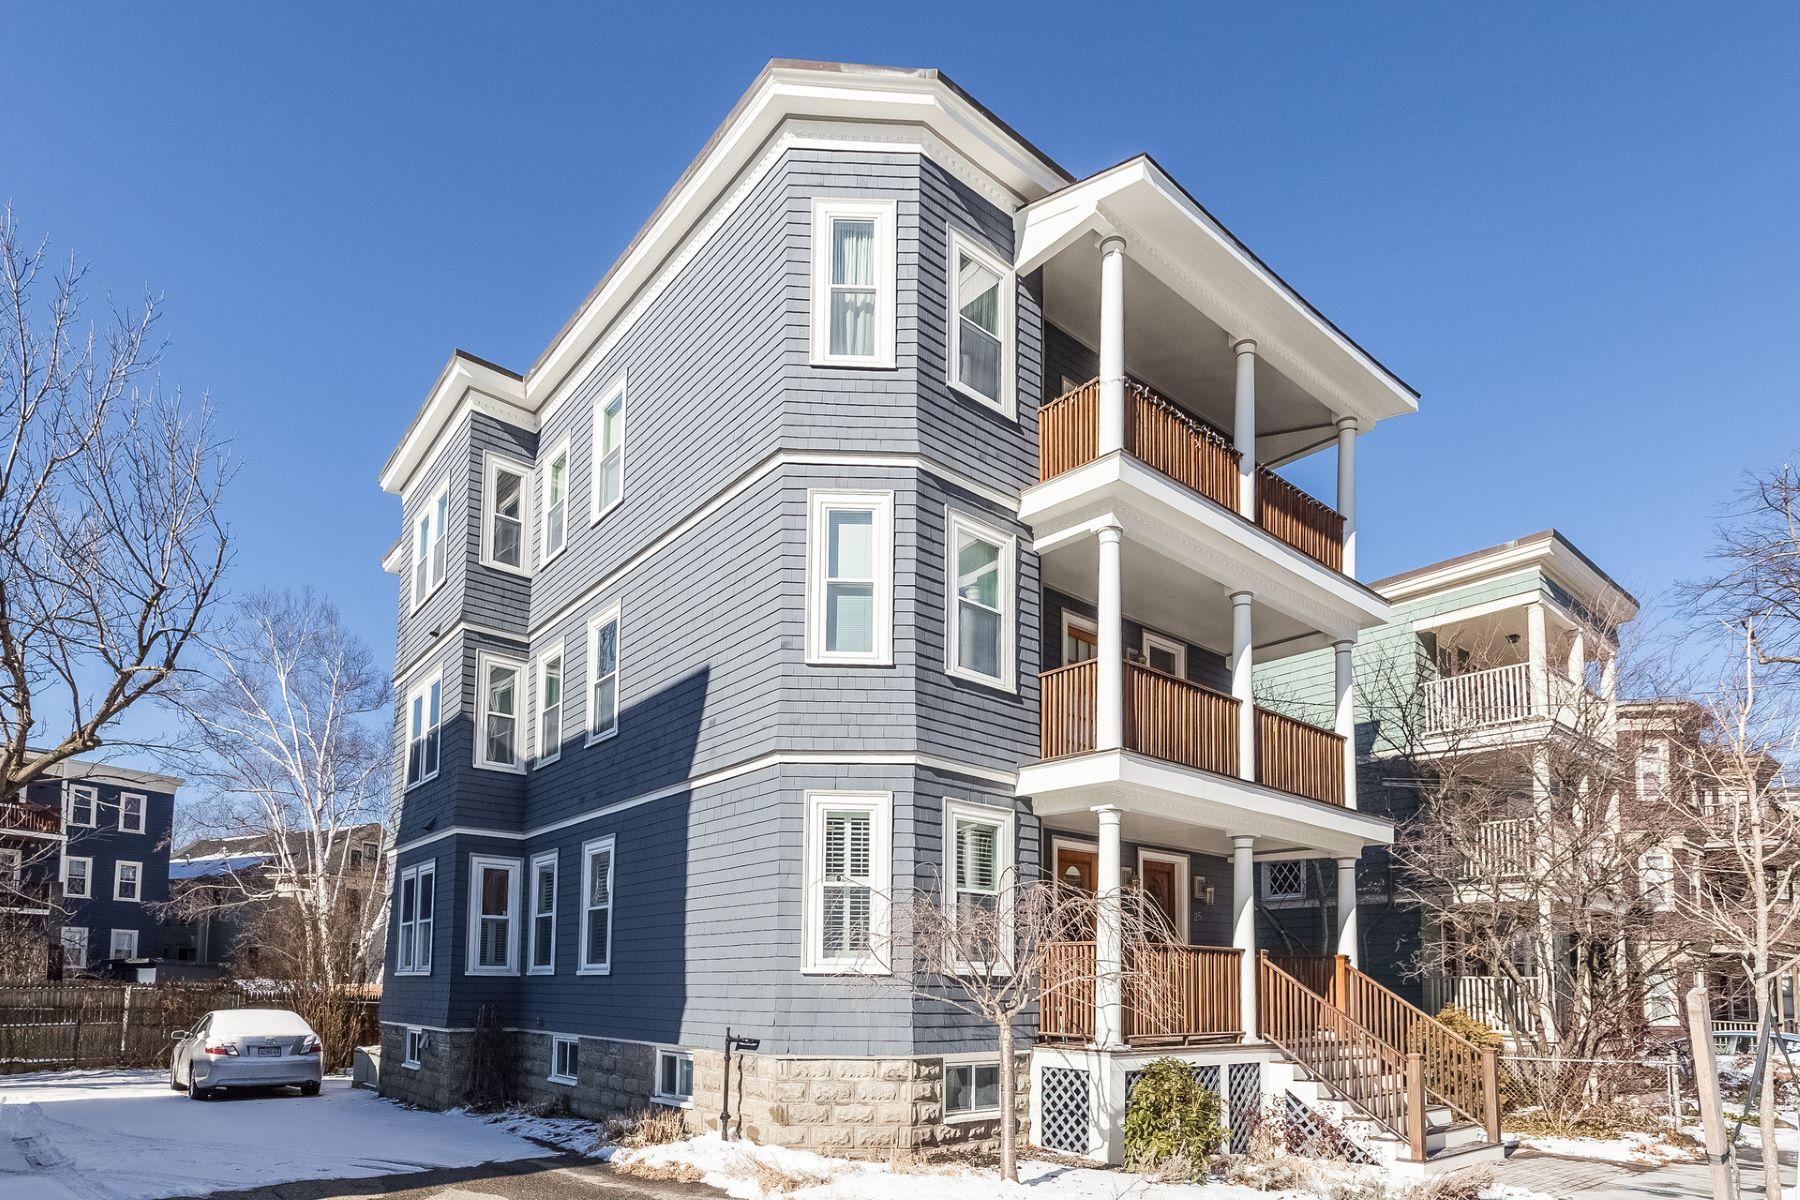 Condomínio para Venda às Huron Village Cambridge 25 Chilton St. Unit 1, Cambridge, Massachusetts, 02138 Estados Unidos